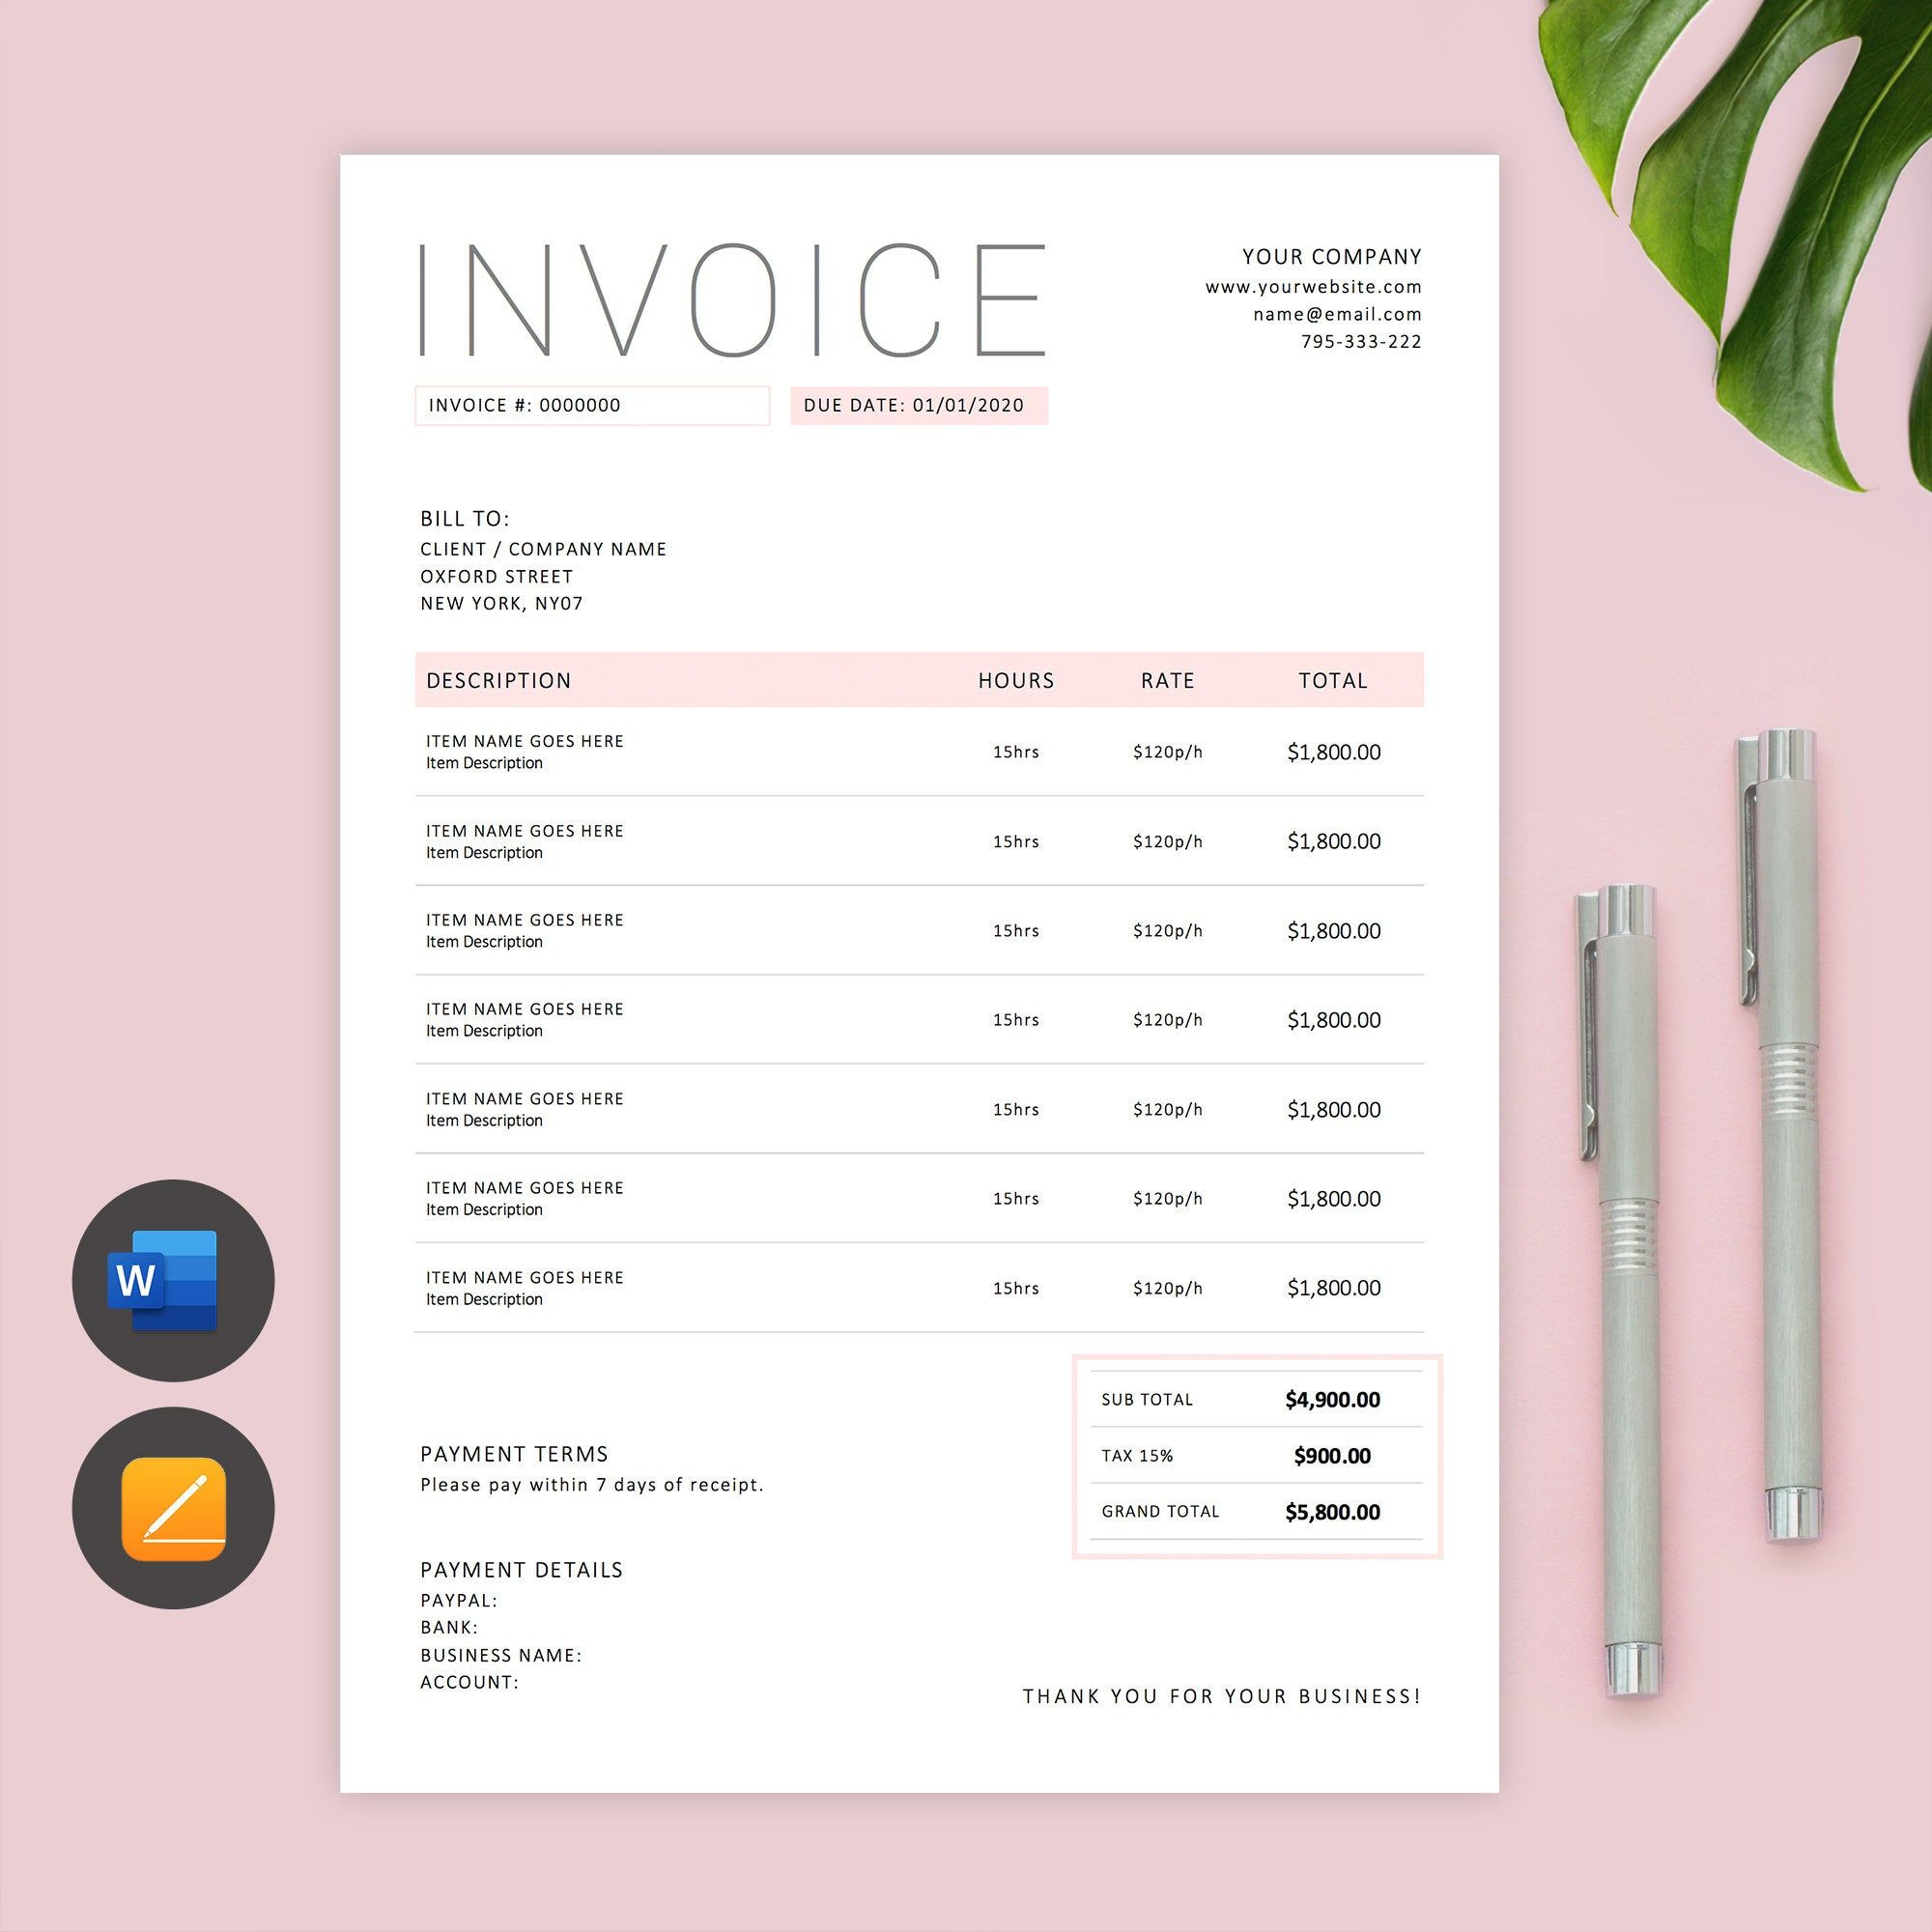 Invoice Template Word Printable Invoice Custom Order Form Photography Invoice Temp Photography Invoice Template Invoice Template Word Photography Invoice